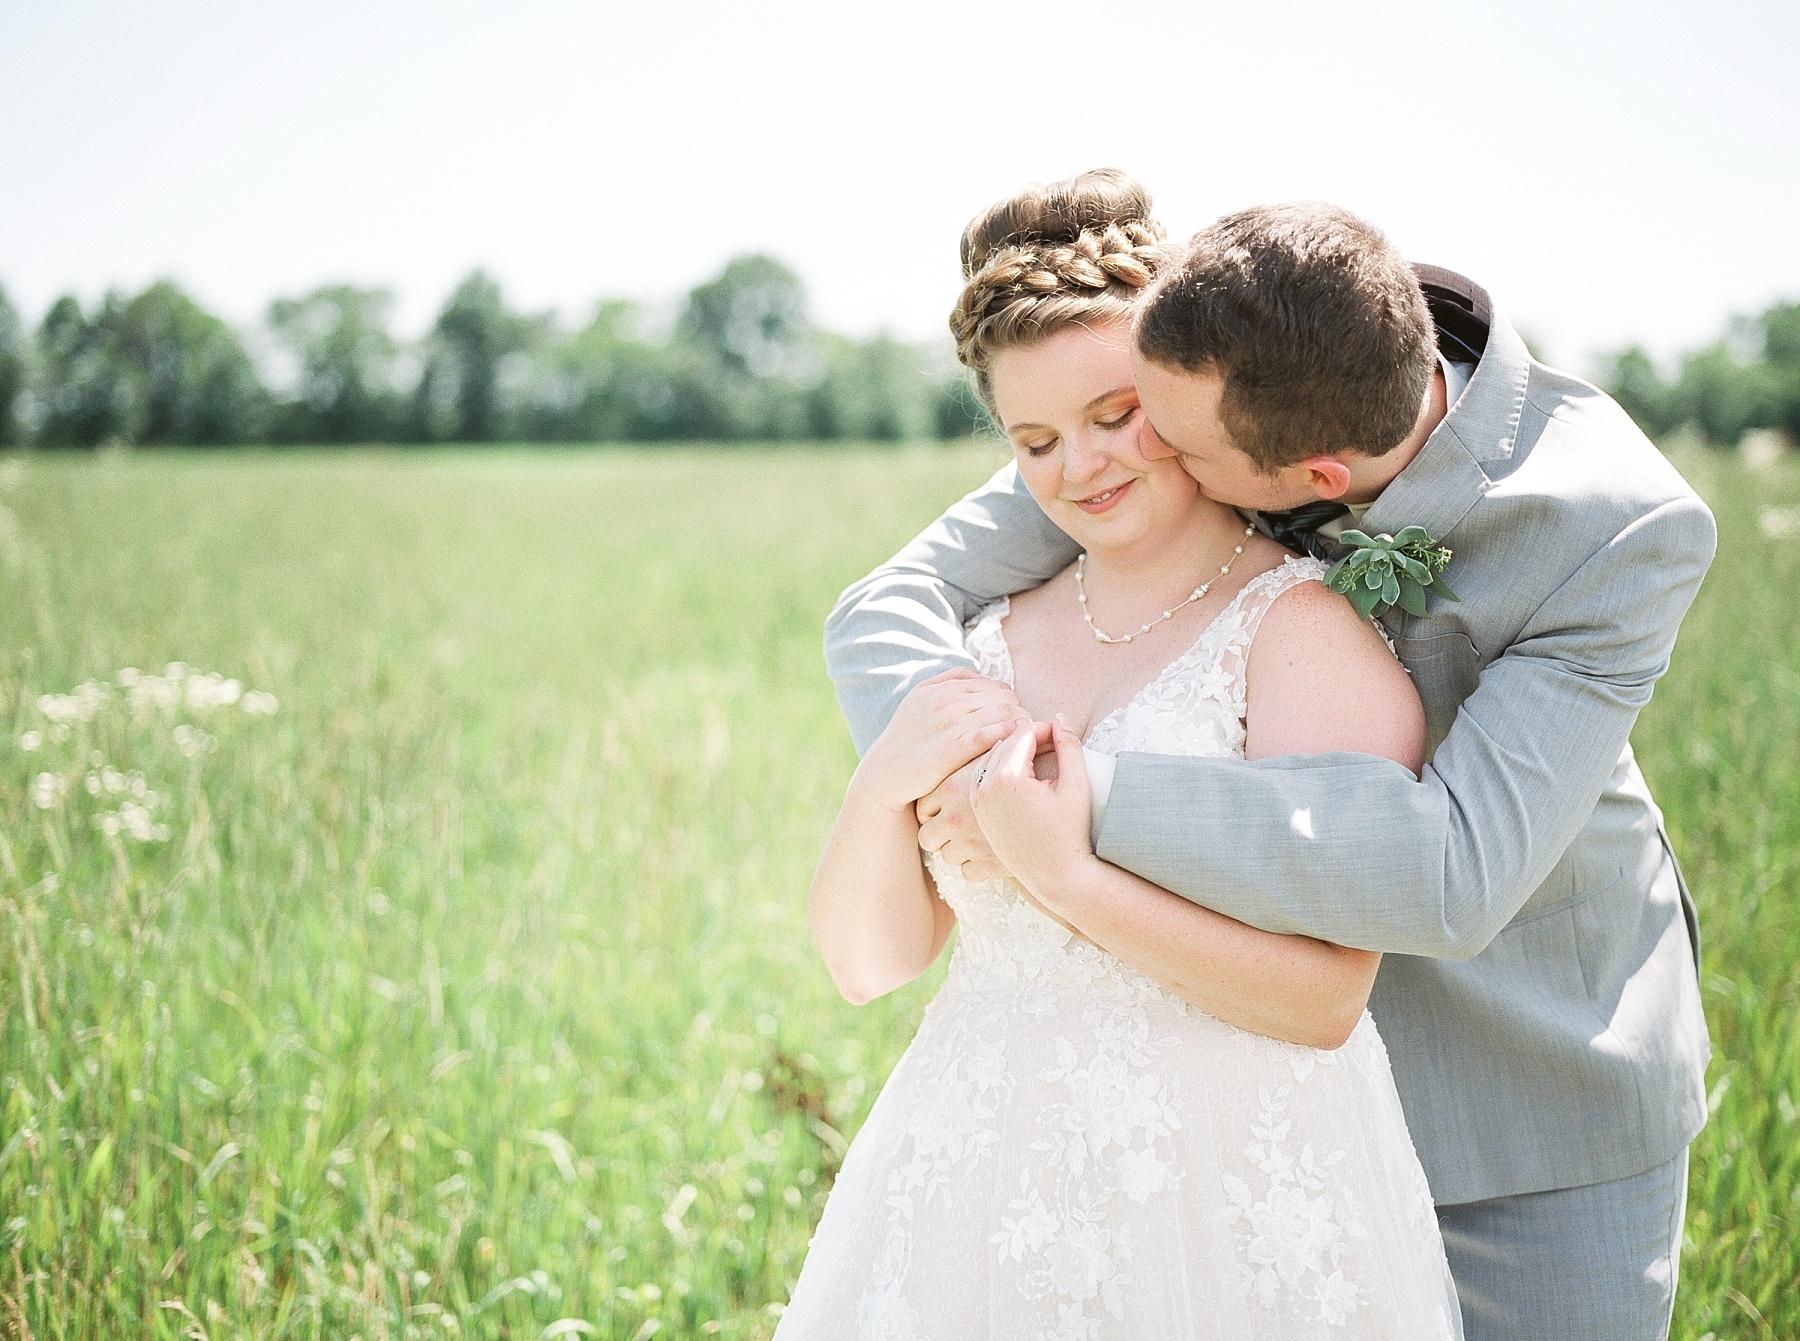 Intimate Summer Wedding at Emerson Fields by Kelsi Kliethermes Photography Best Missouri and Maui Wedding Photographer_0010.jpg